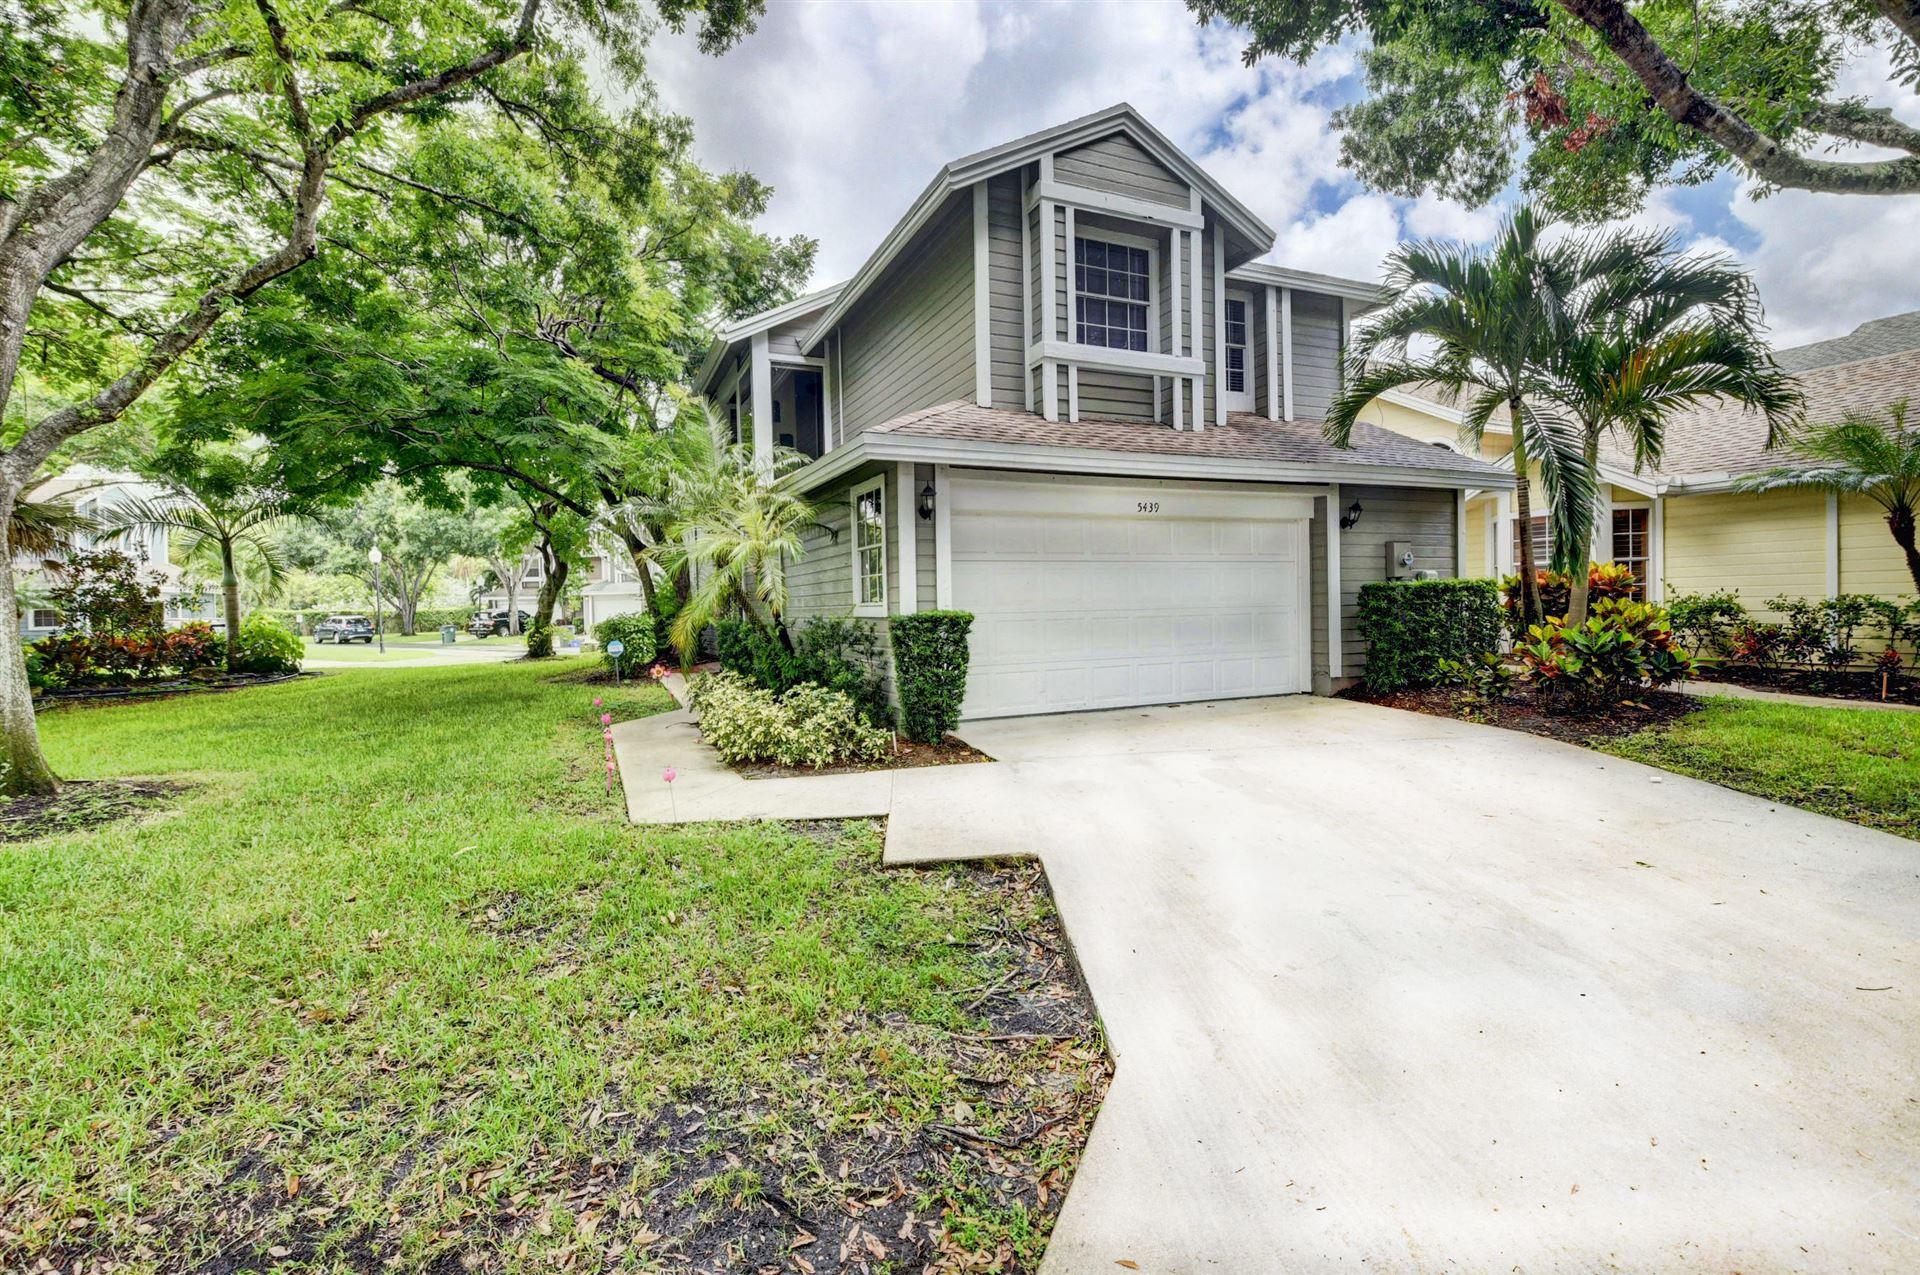 5439 214th Court S, Boca Raton, FL 33486 - #: RX-10732954